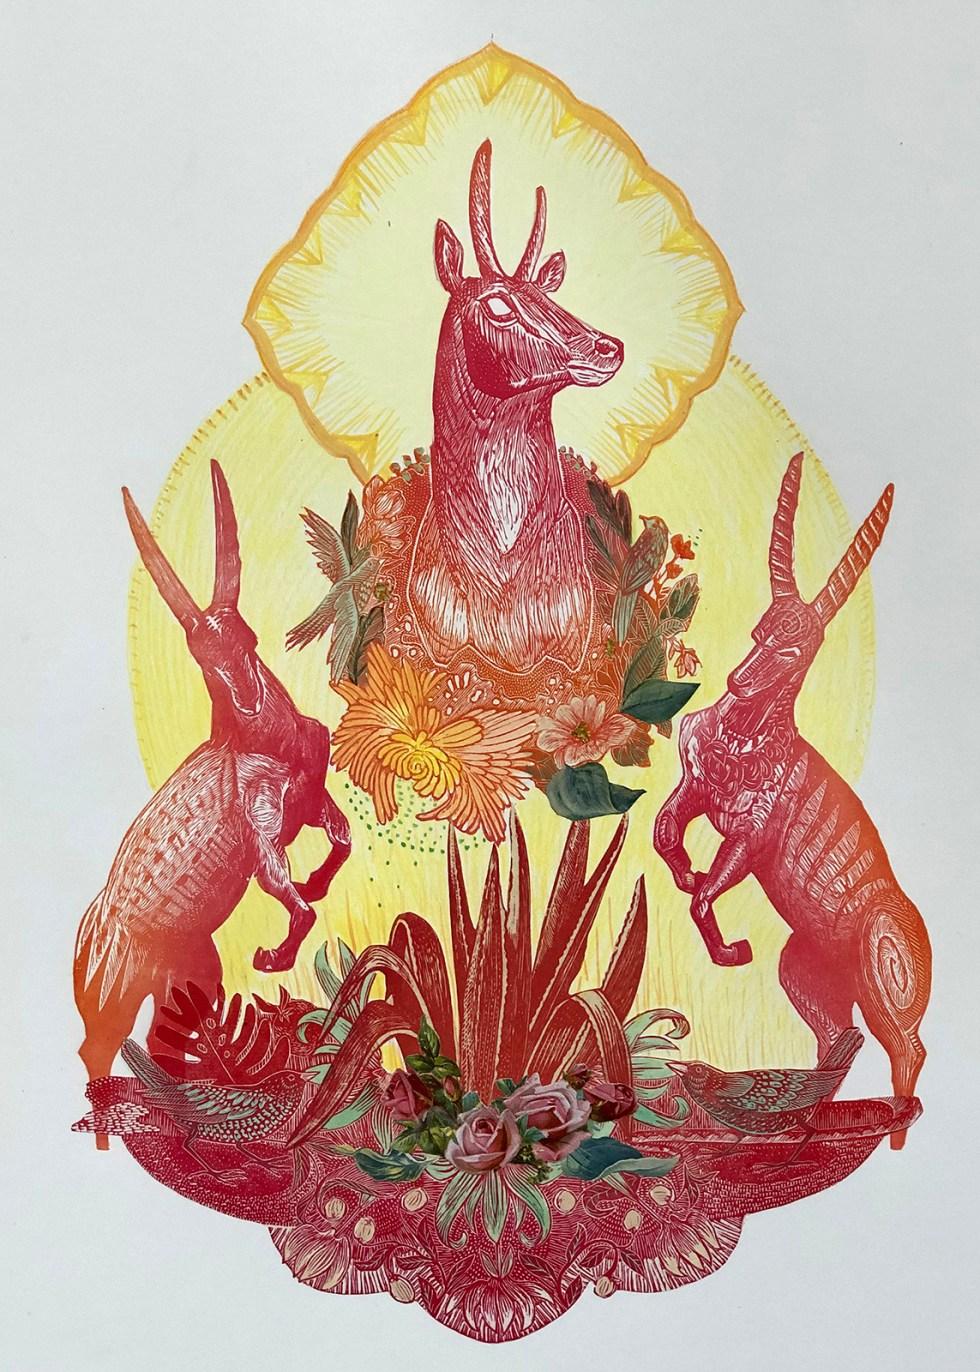 king-of-antelopes-mixed-media-collage-print